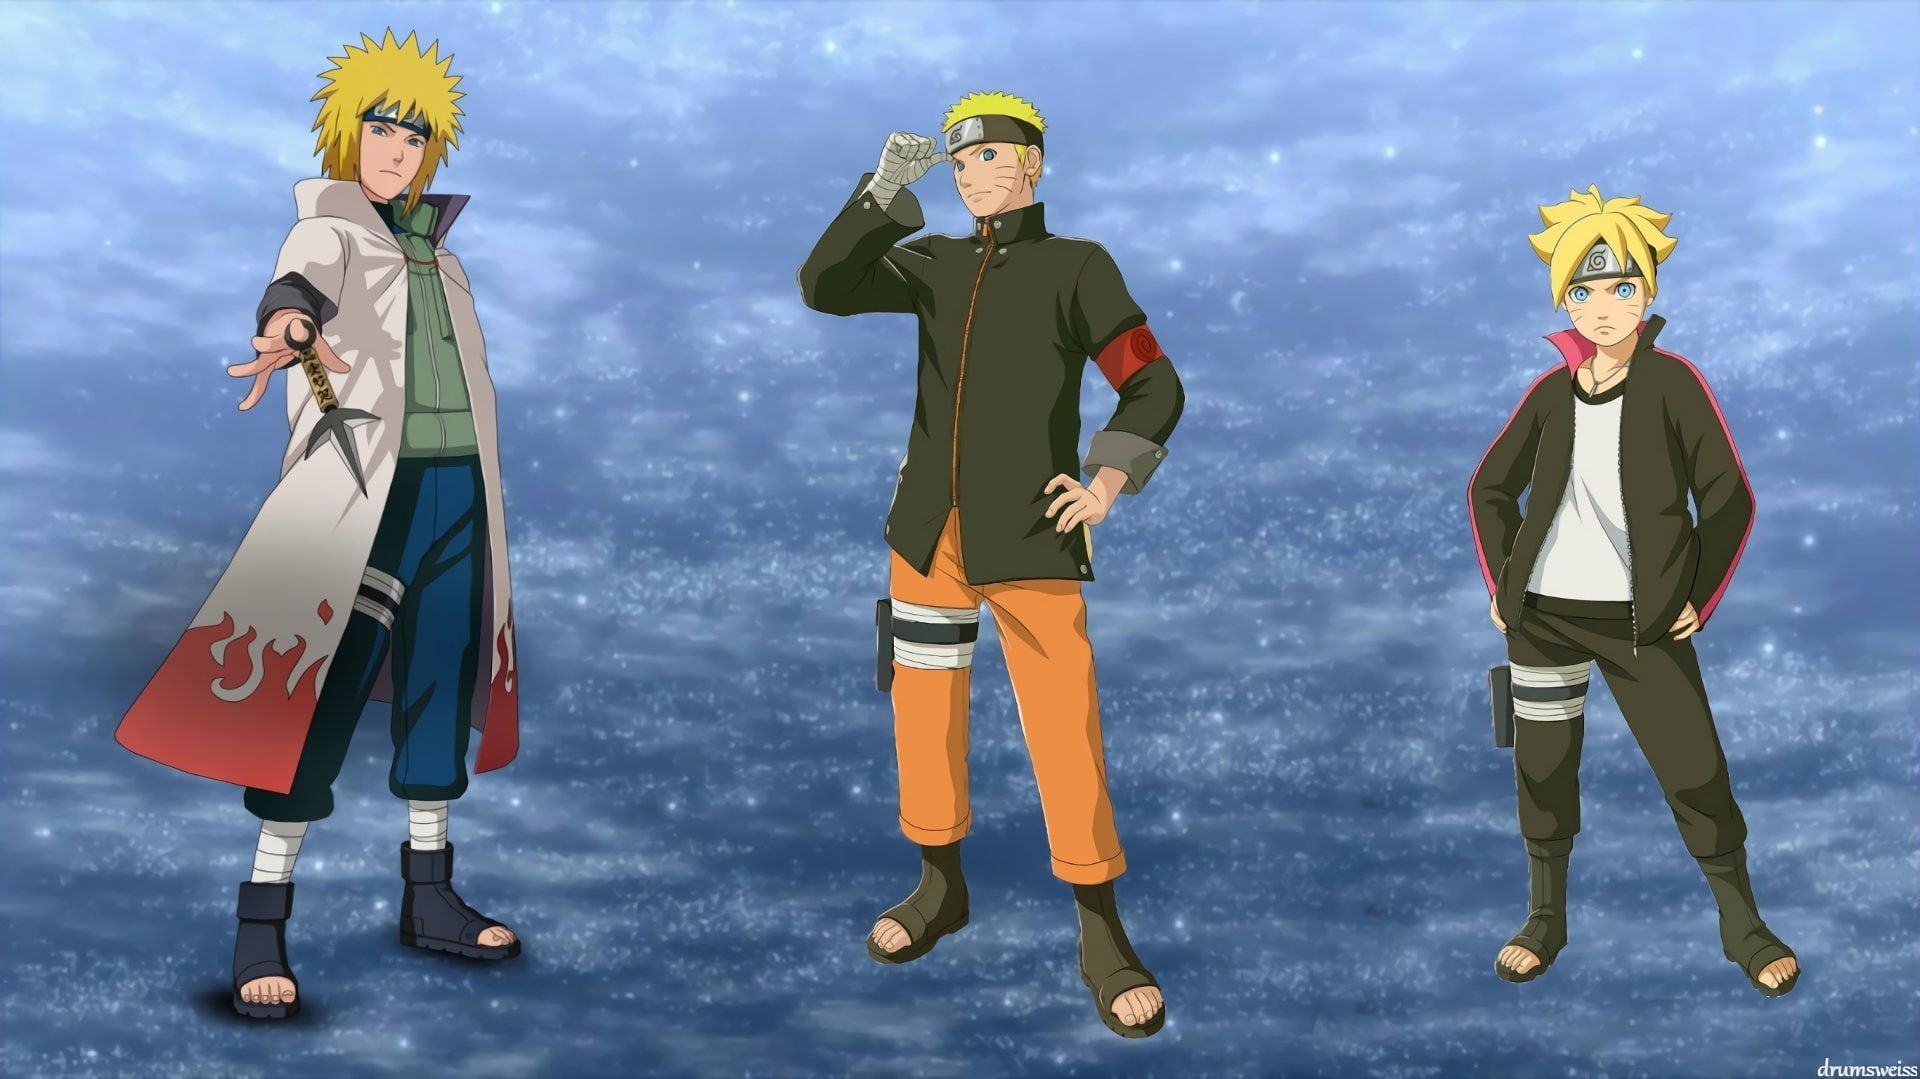 Anime Boruto Boruto Uzumaki Minato Namikaze Naruto Uzumaki 1080p Wallpaper Hdwallpaper Desktop Boruto Naruto Uzumaki Full Hd Pictures